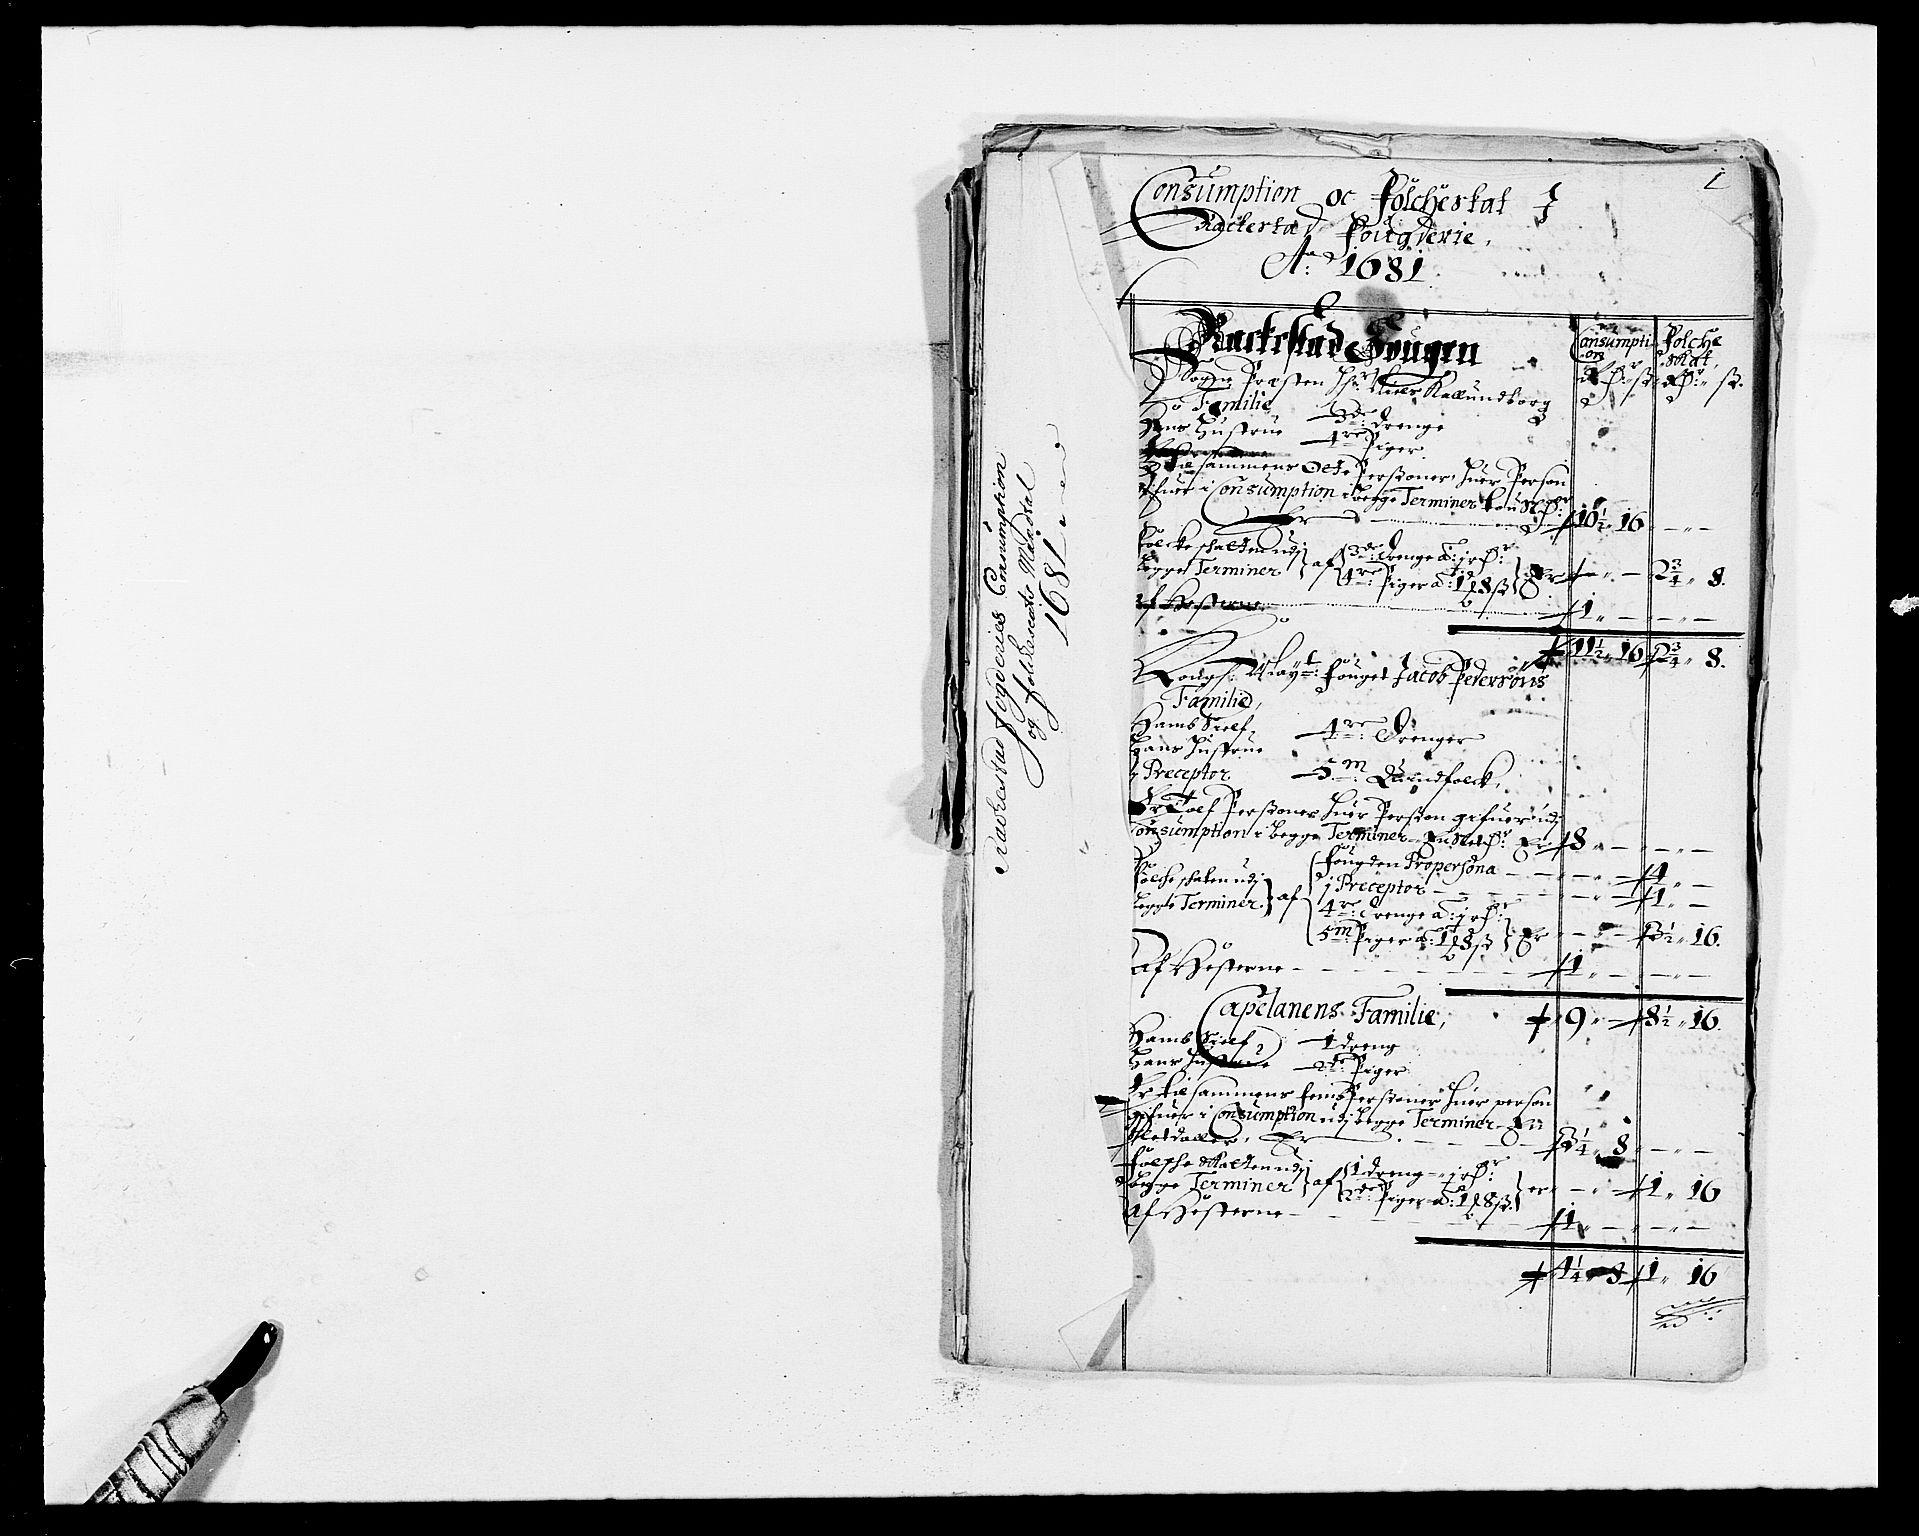 RA, Rentekammeret inntil 1814, Reviderte regnskaper, Fogderegnskap, R05/L0272: Fogderegnskap Rakkestad, 1680-1681, s. 381